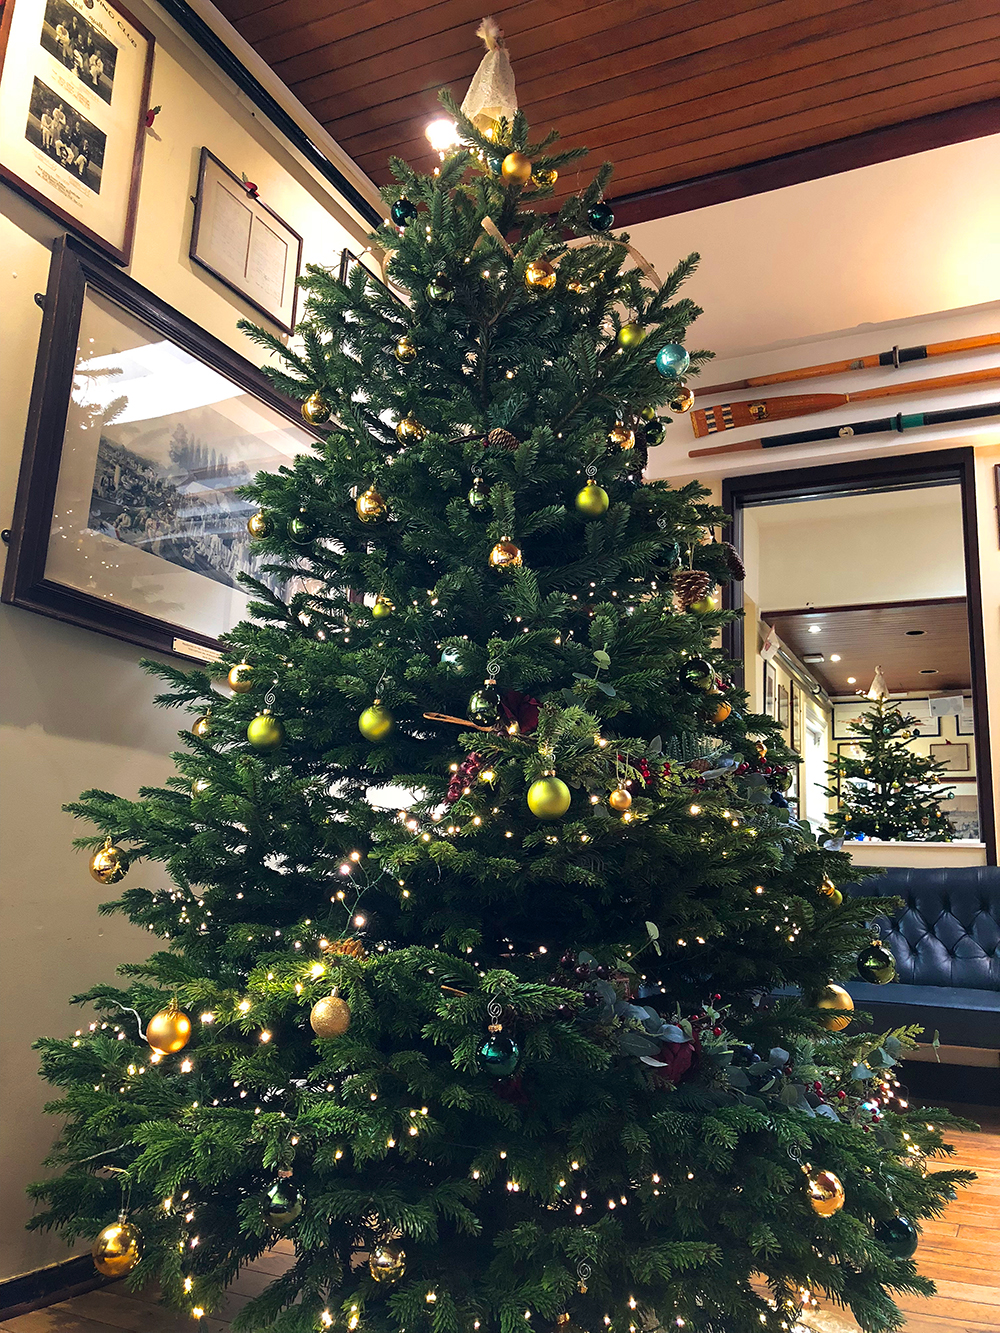 The London Rowing Club Christmas tree, 2018 on display in the Club's Fairbairn Room.  (Photo courtesy of Bob Silver)